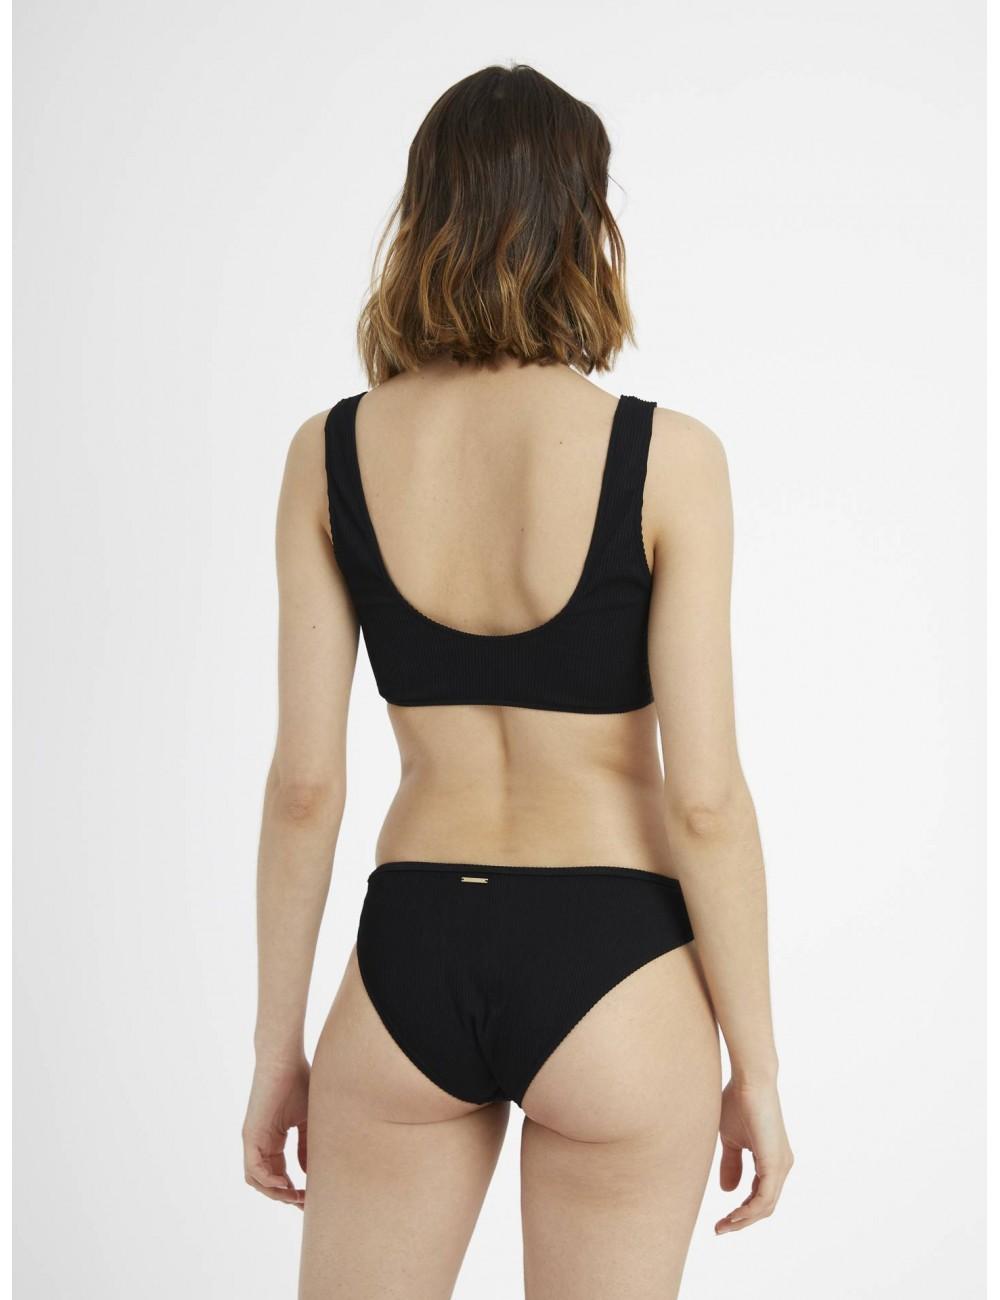 BRAGUITA bikini negro sencilla